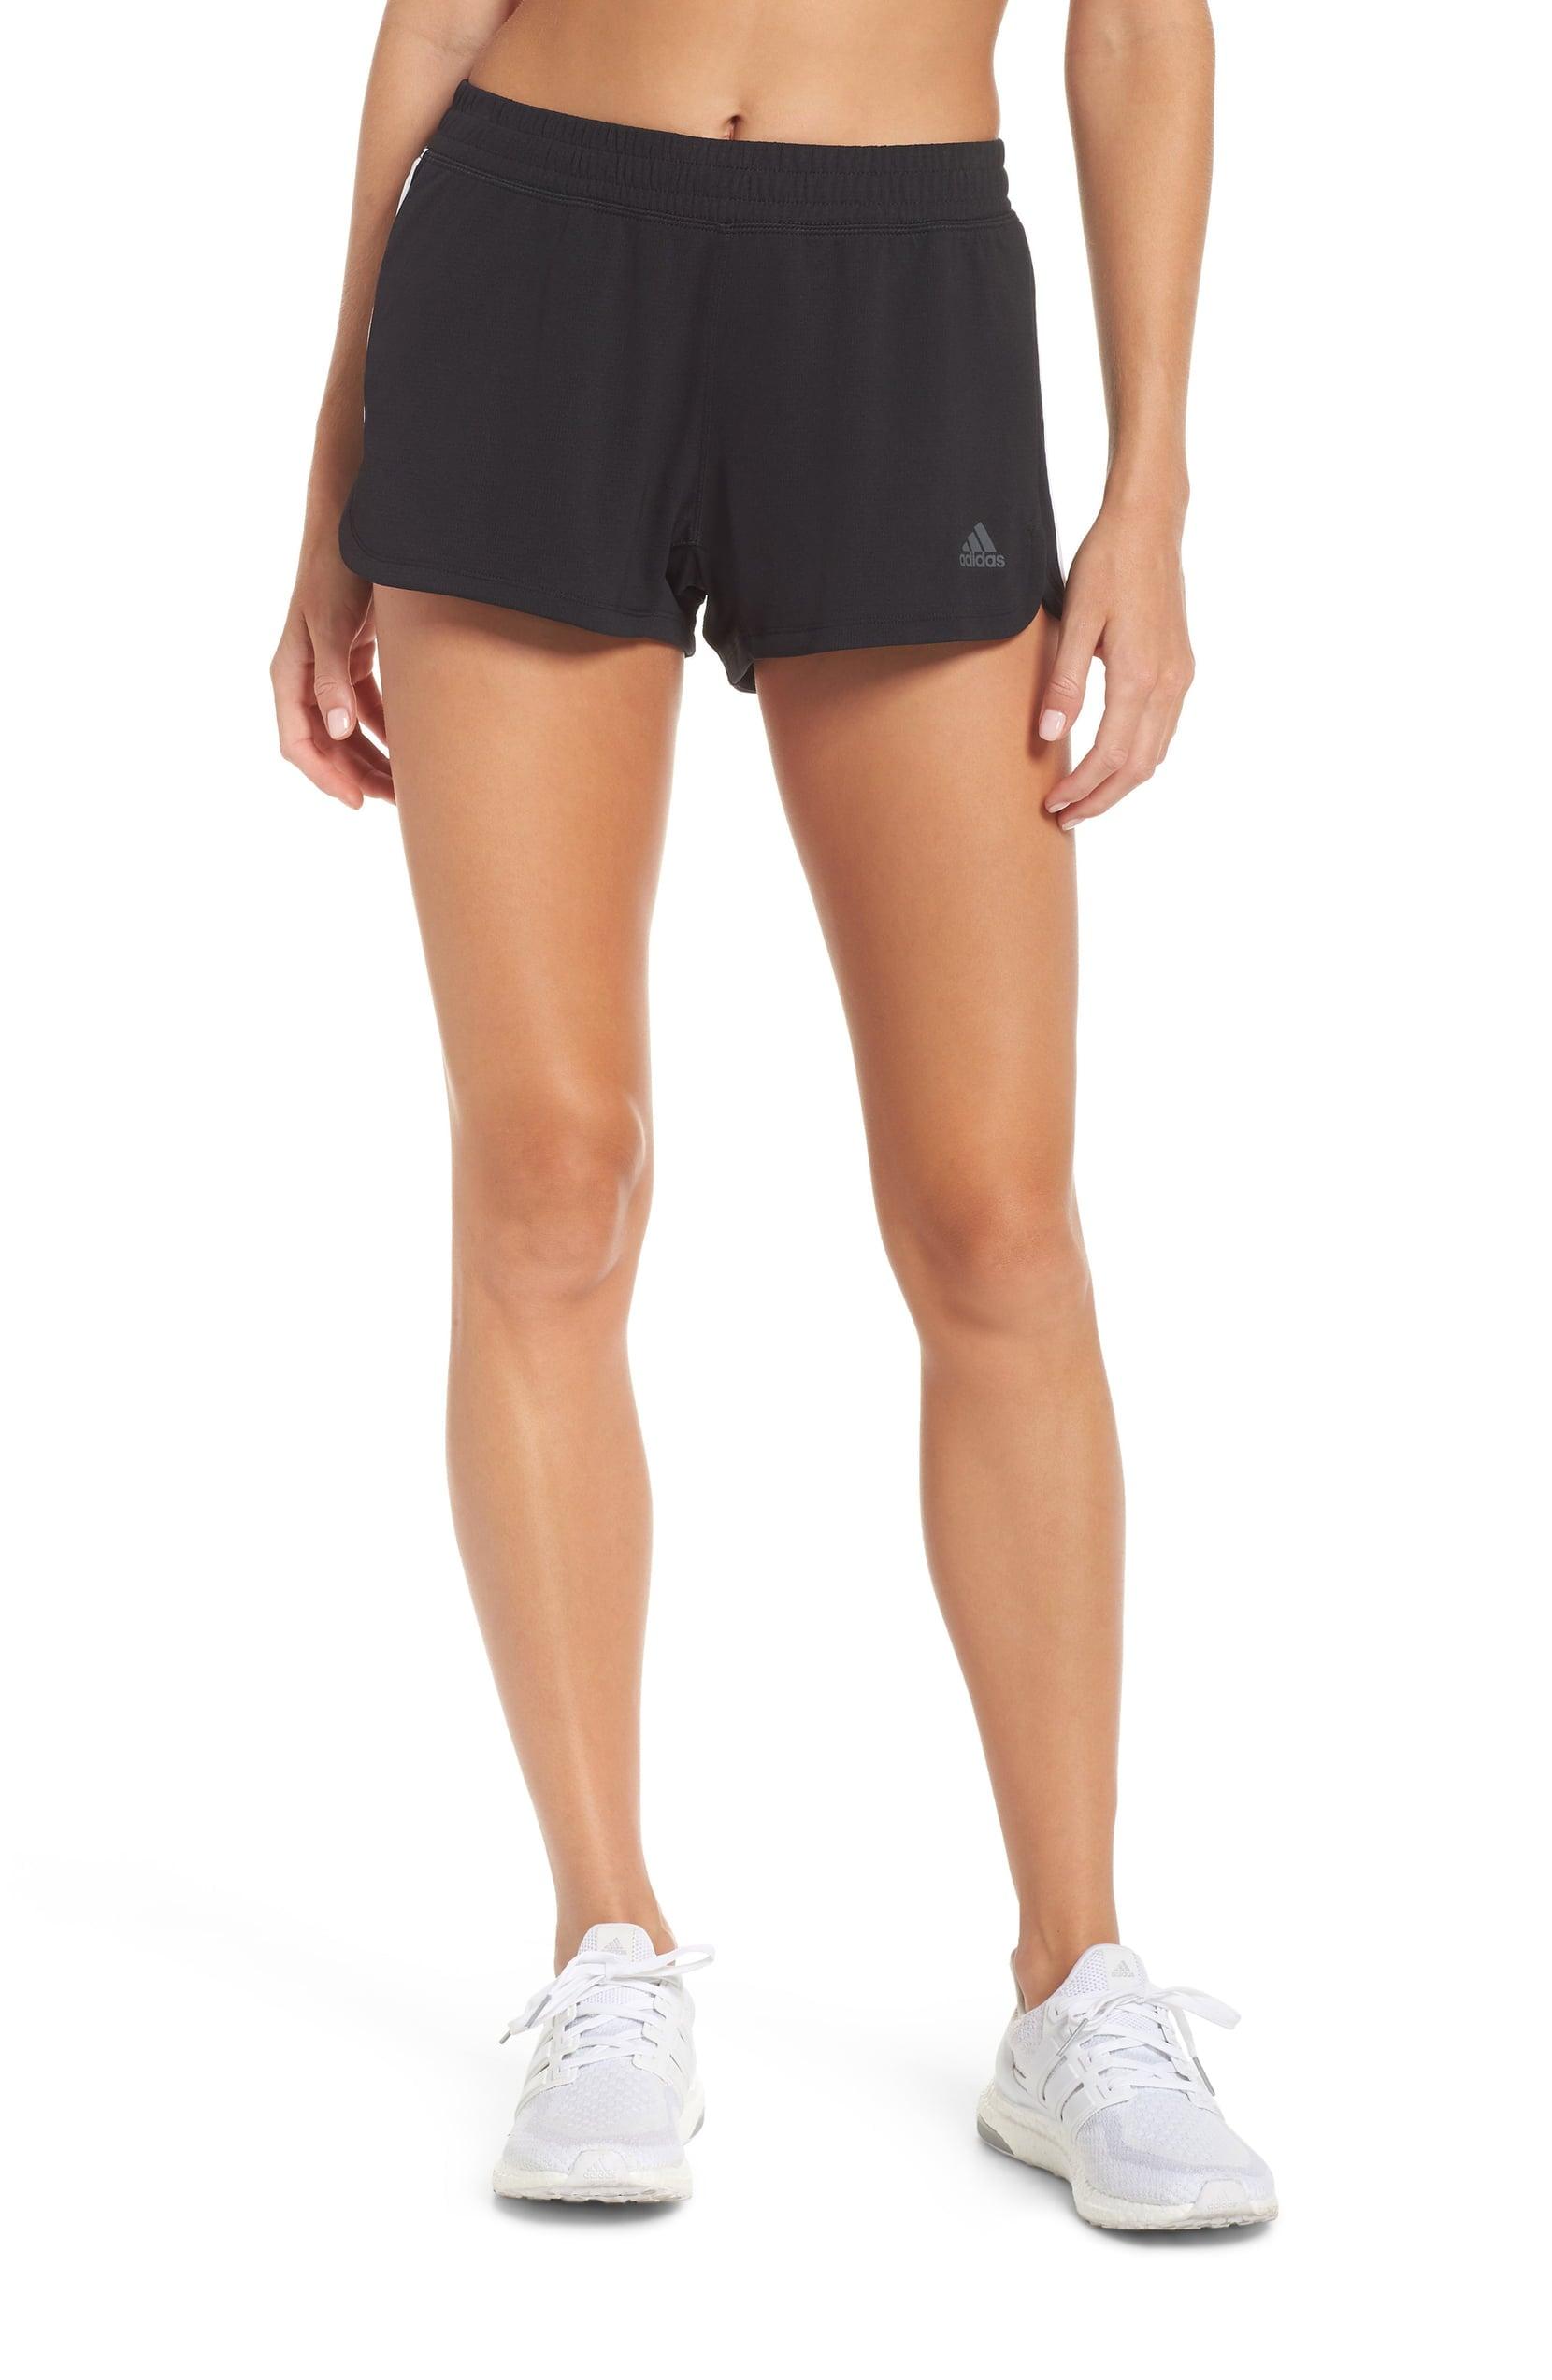 Best Workout Shorts For Women | POPSUGAR Fitness